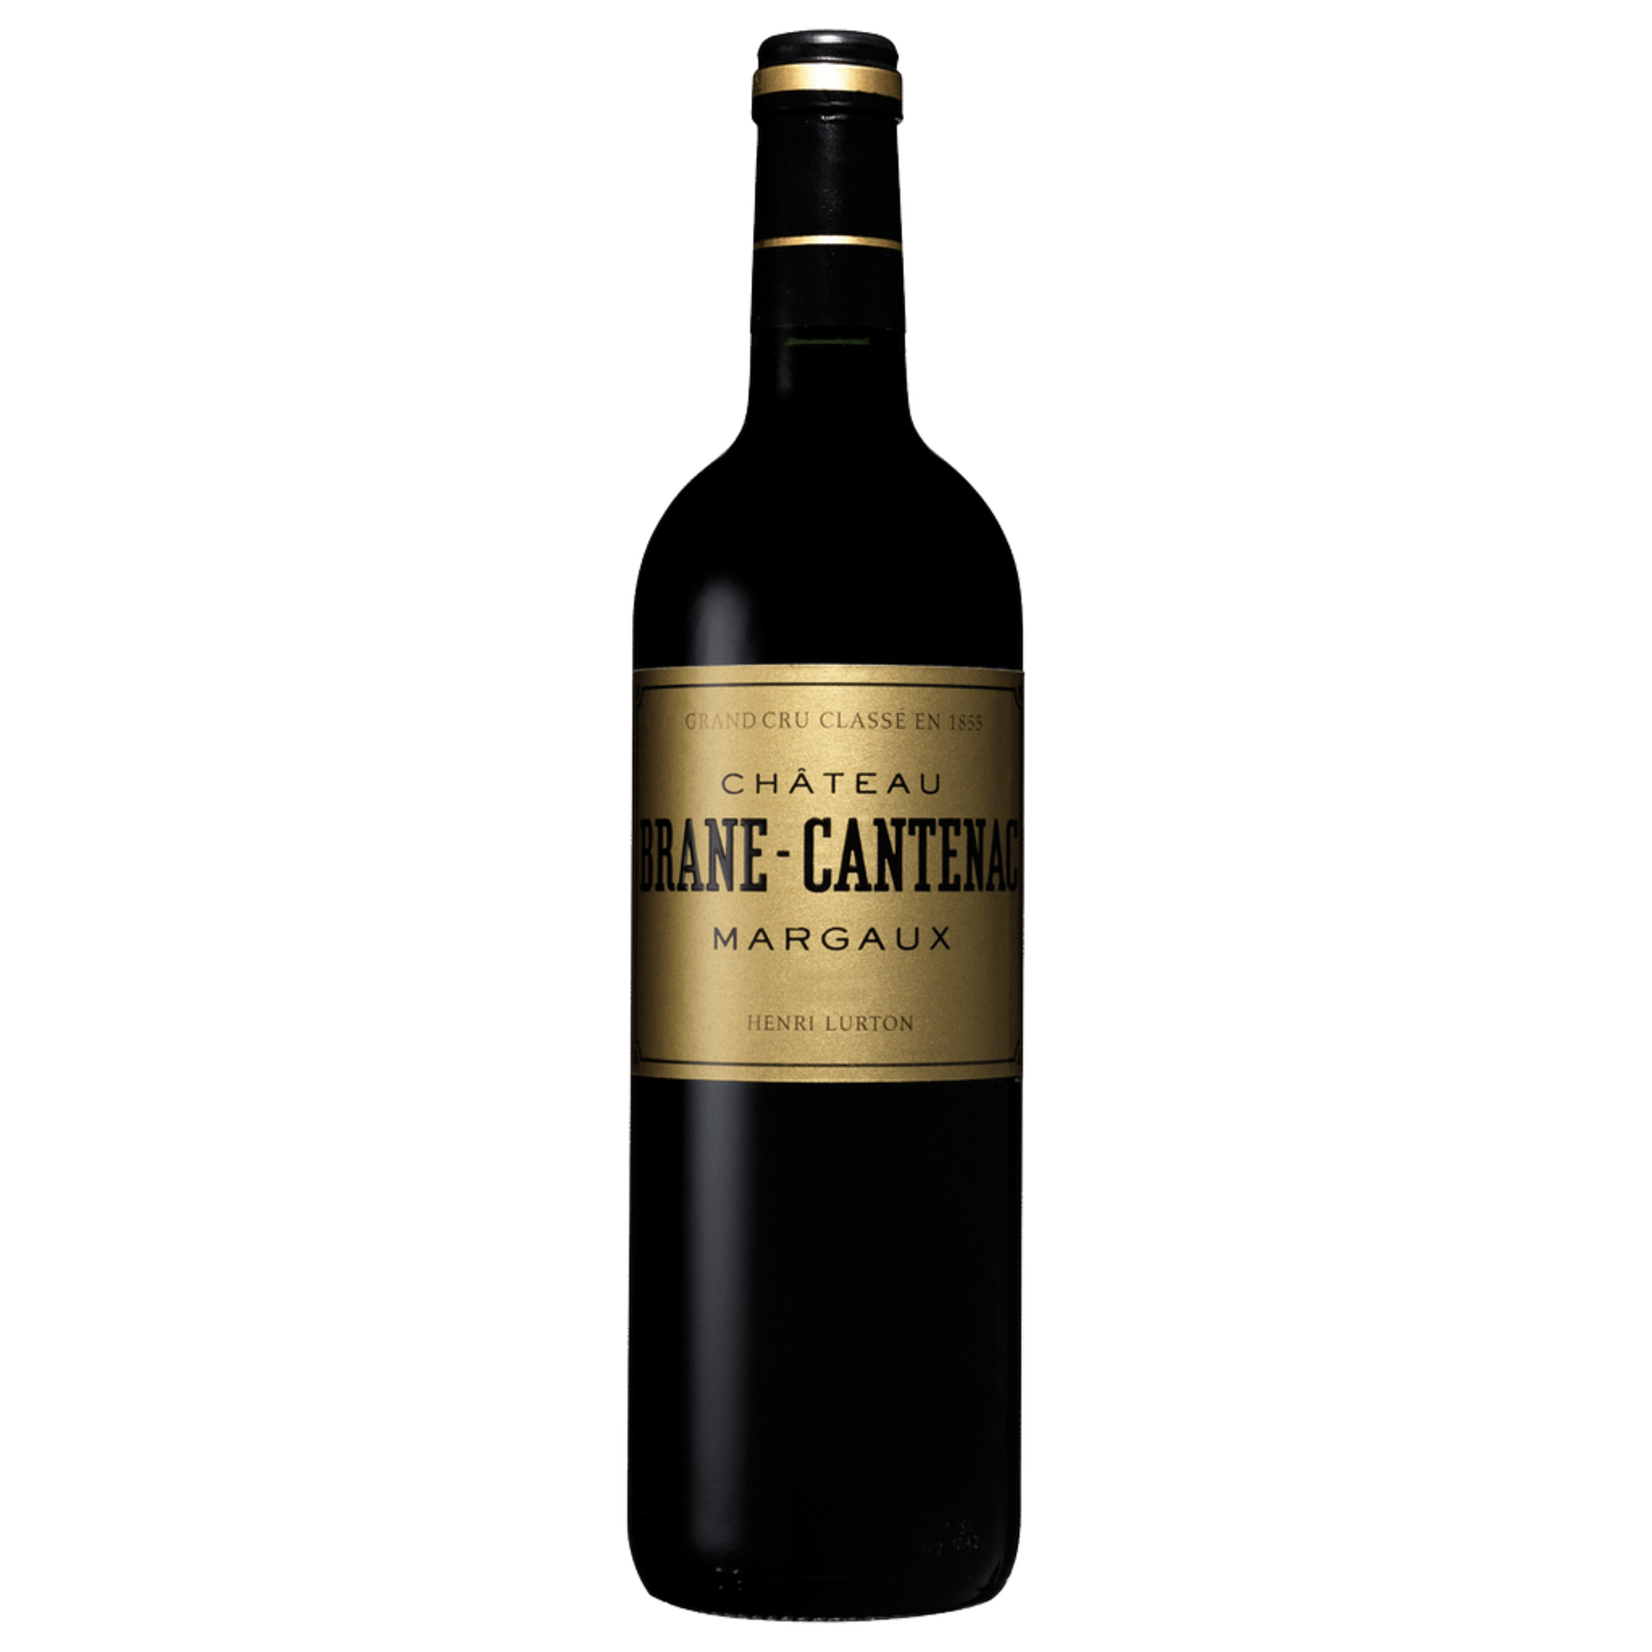 Wine Chateau Brane Cantenac 2000